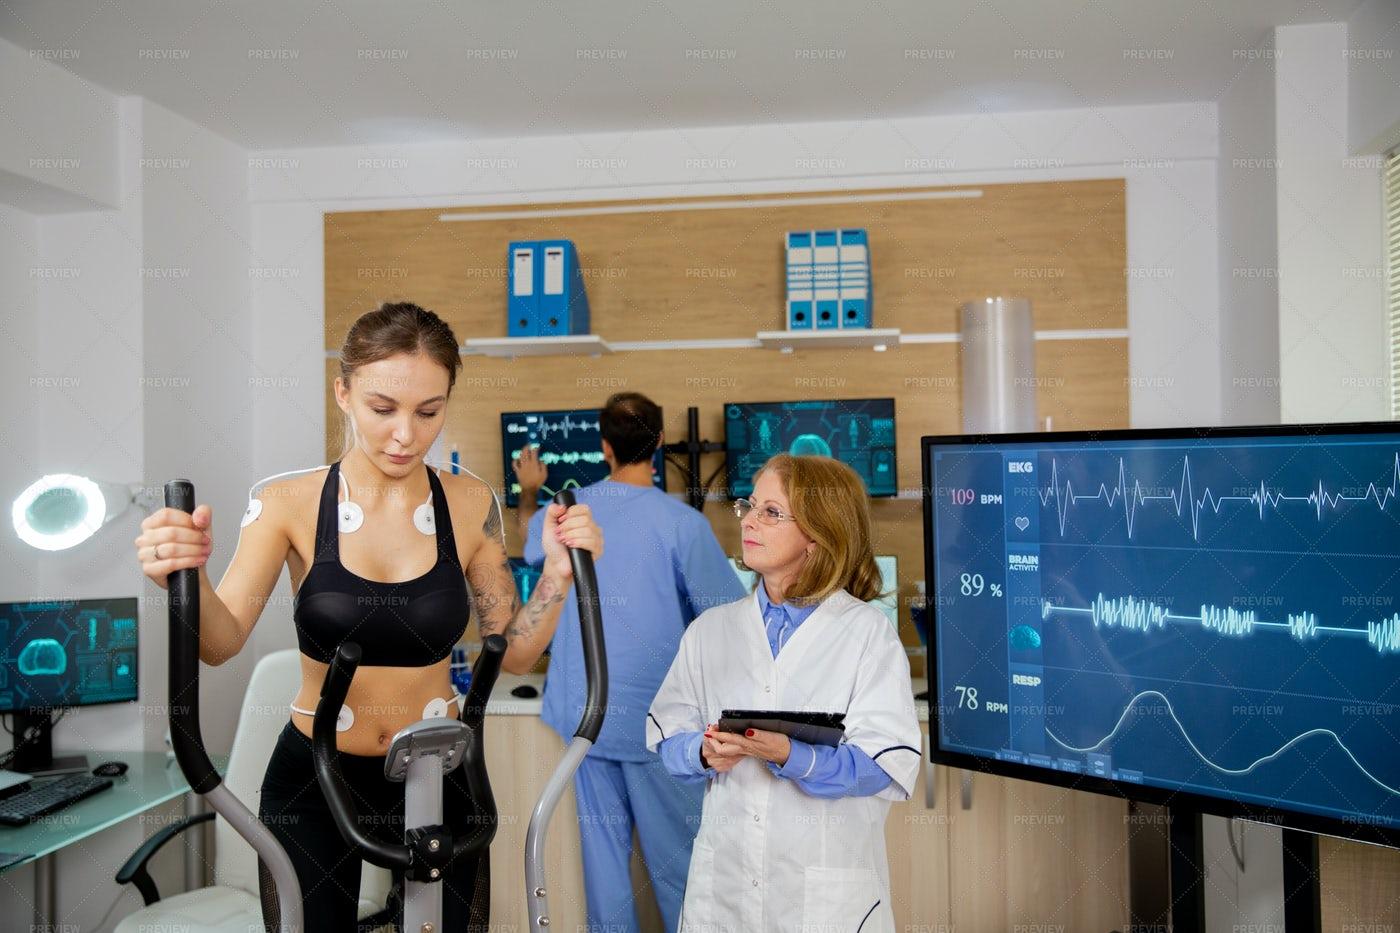 Female Athlete Doing Physical Effort On: Stock Photos